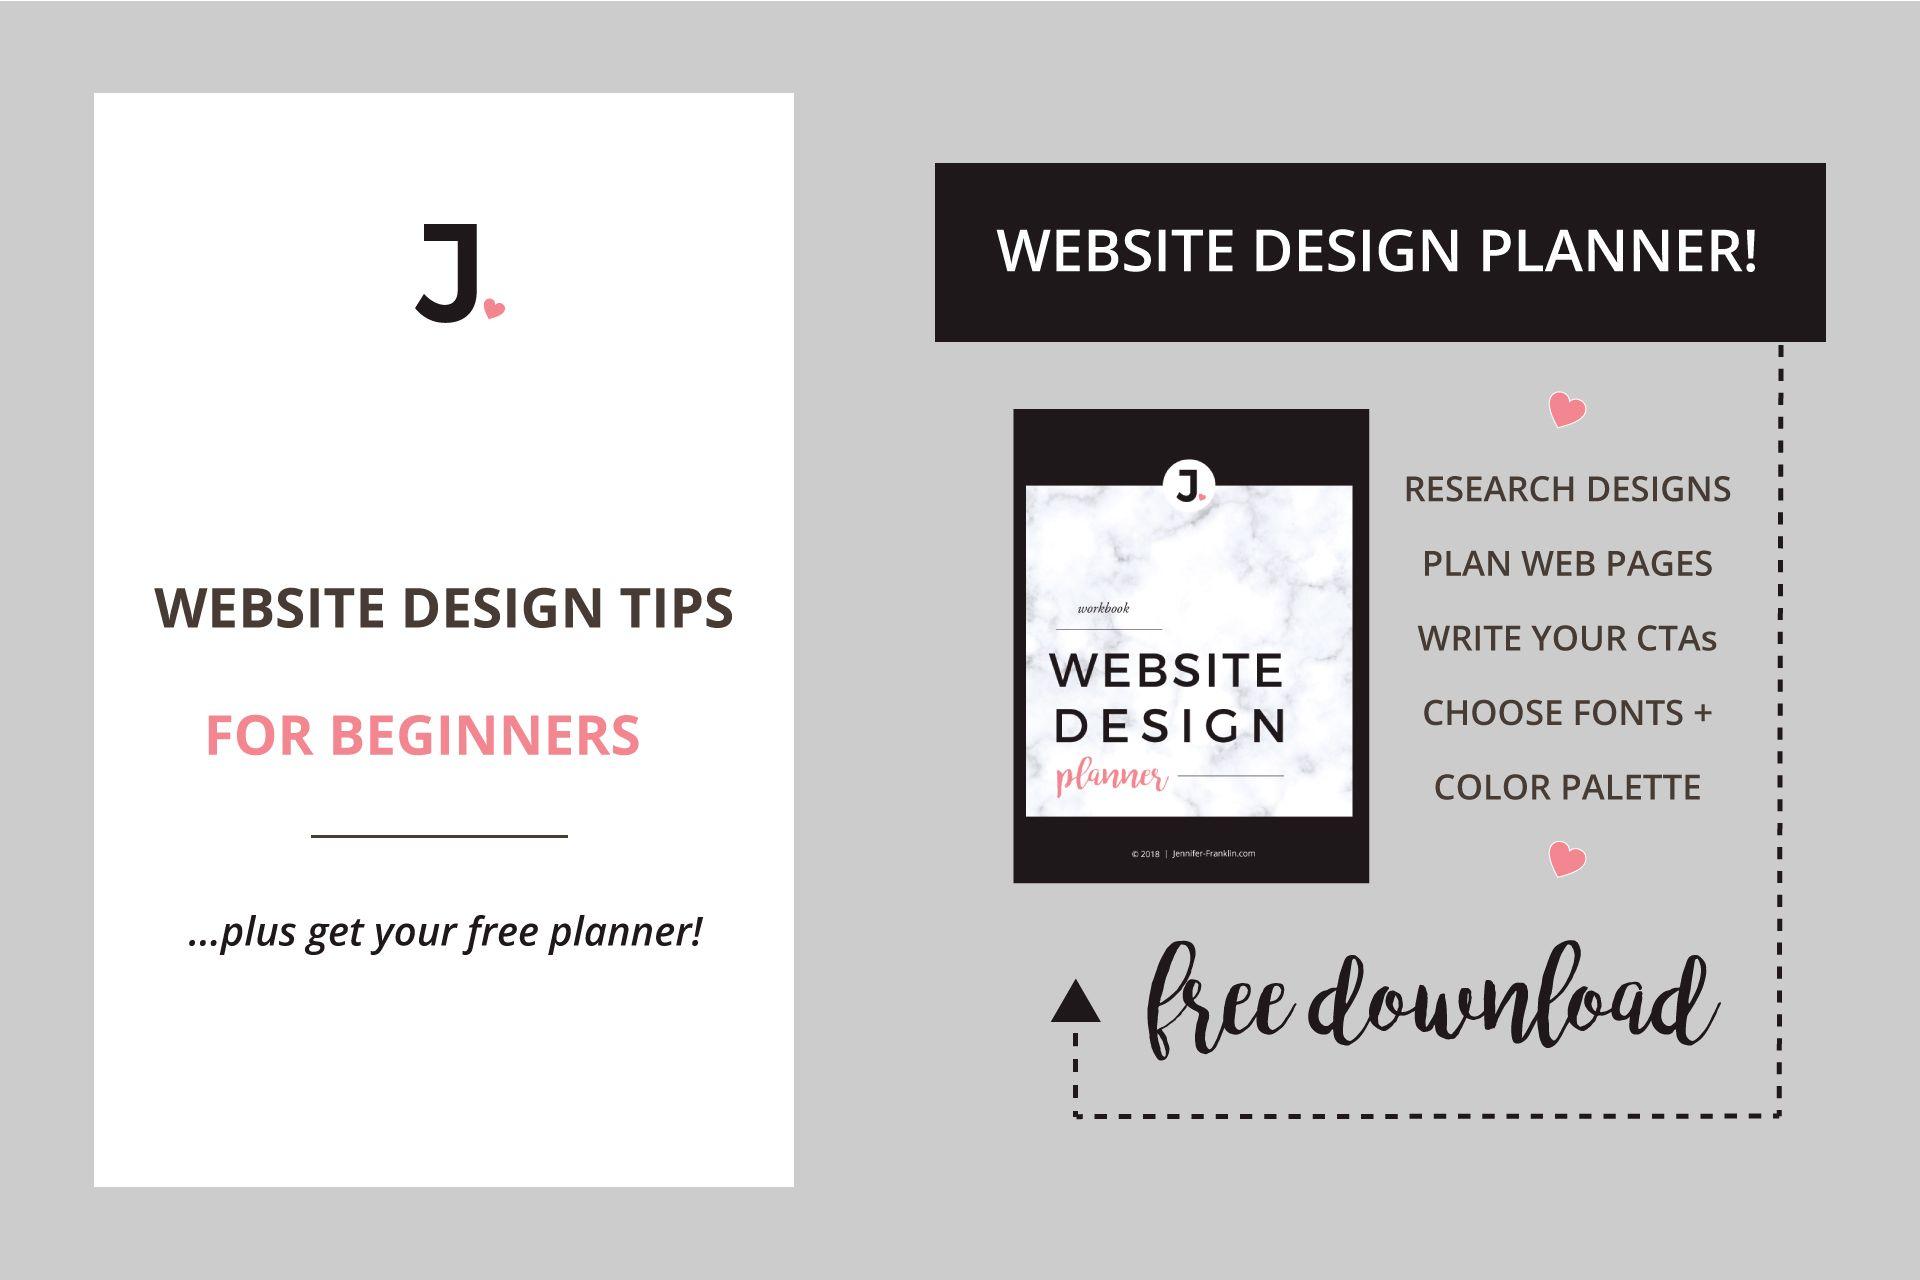 Website Design Tips For Beginners Free Web Design Planner Free Web Design Web Design Website Design